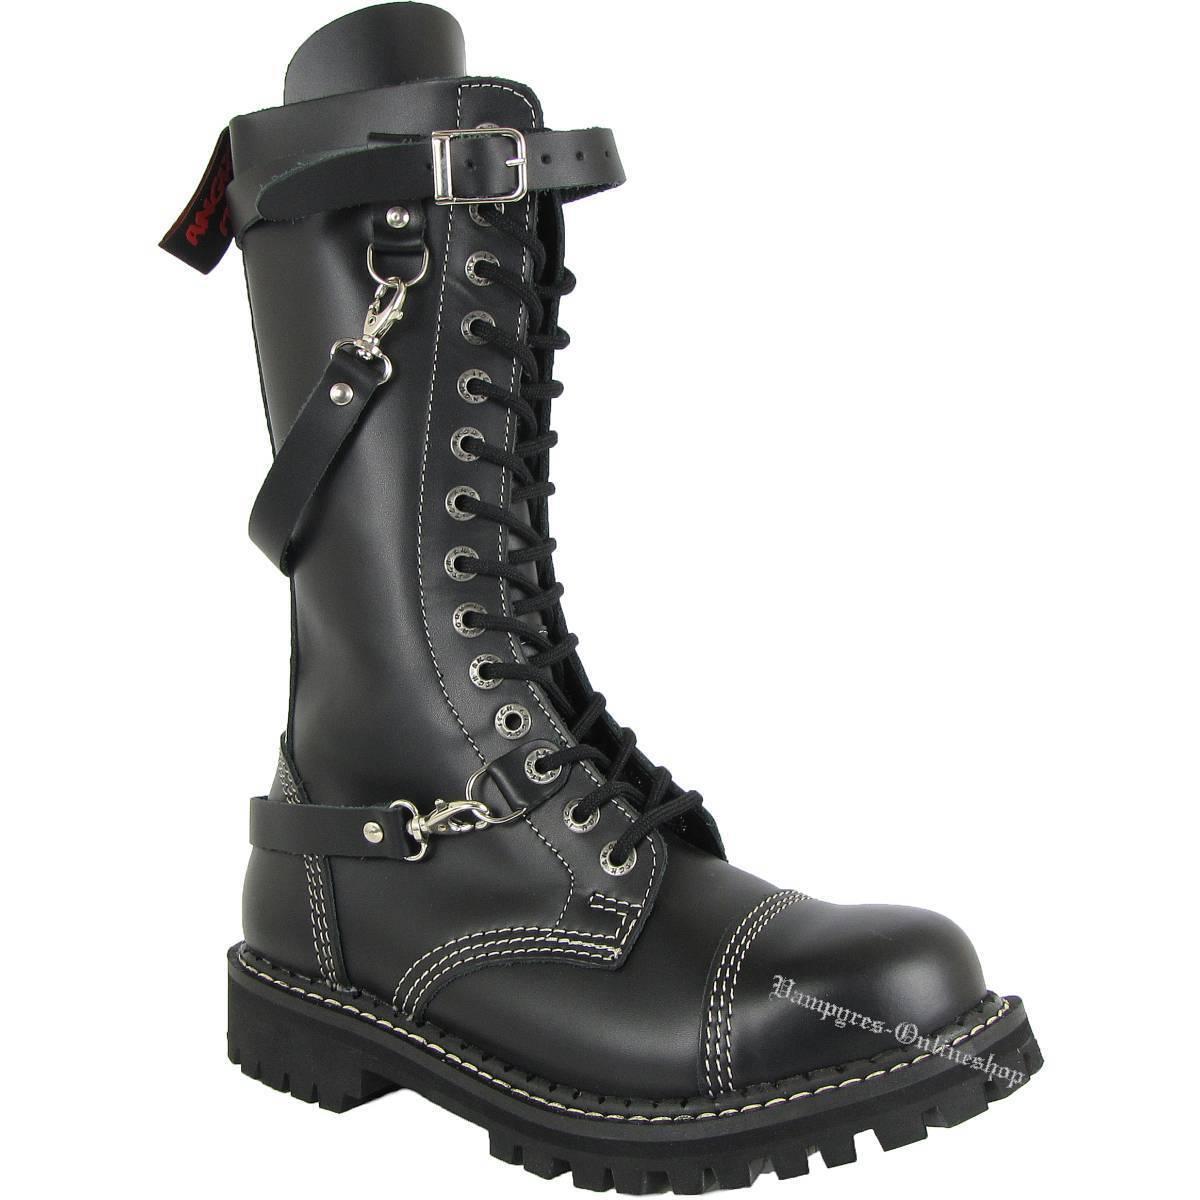 Angry Itch 14-Loch 3-Riemen Reißverschluss black Rangers Stiefel Stahlkappen